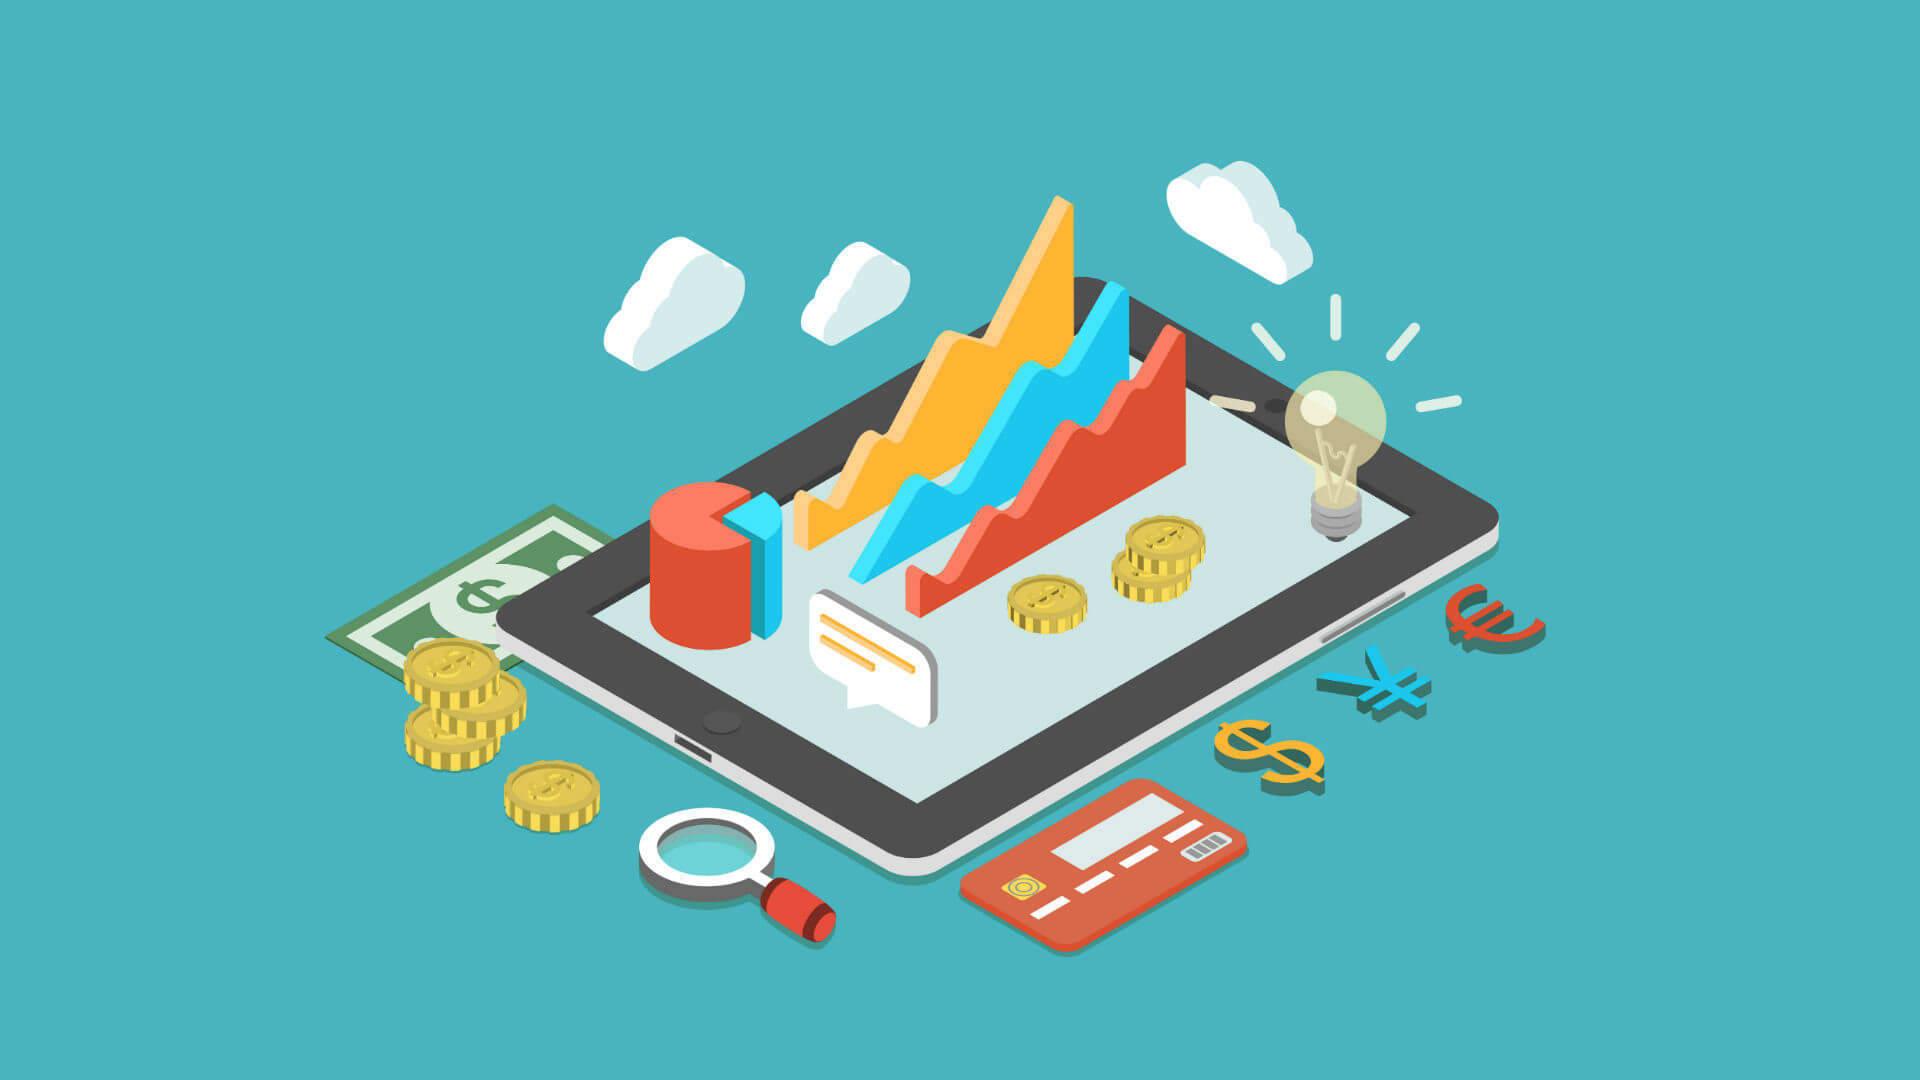 Trade Marketing Digital no Ecommerce Compras Online